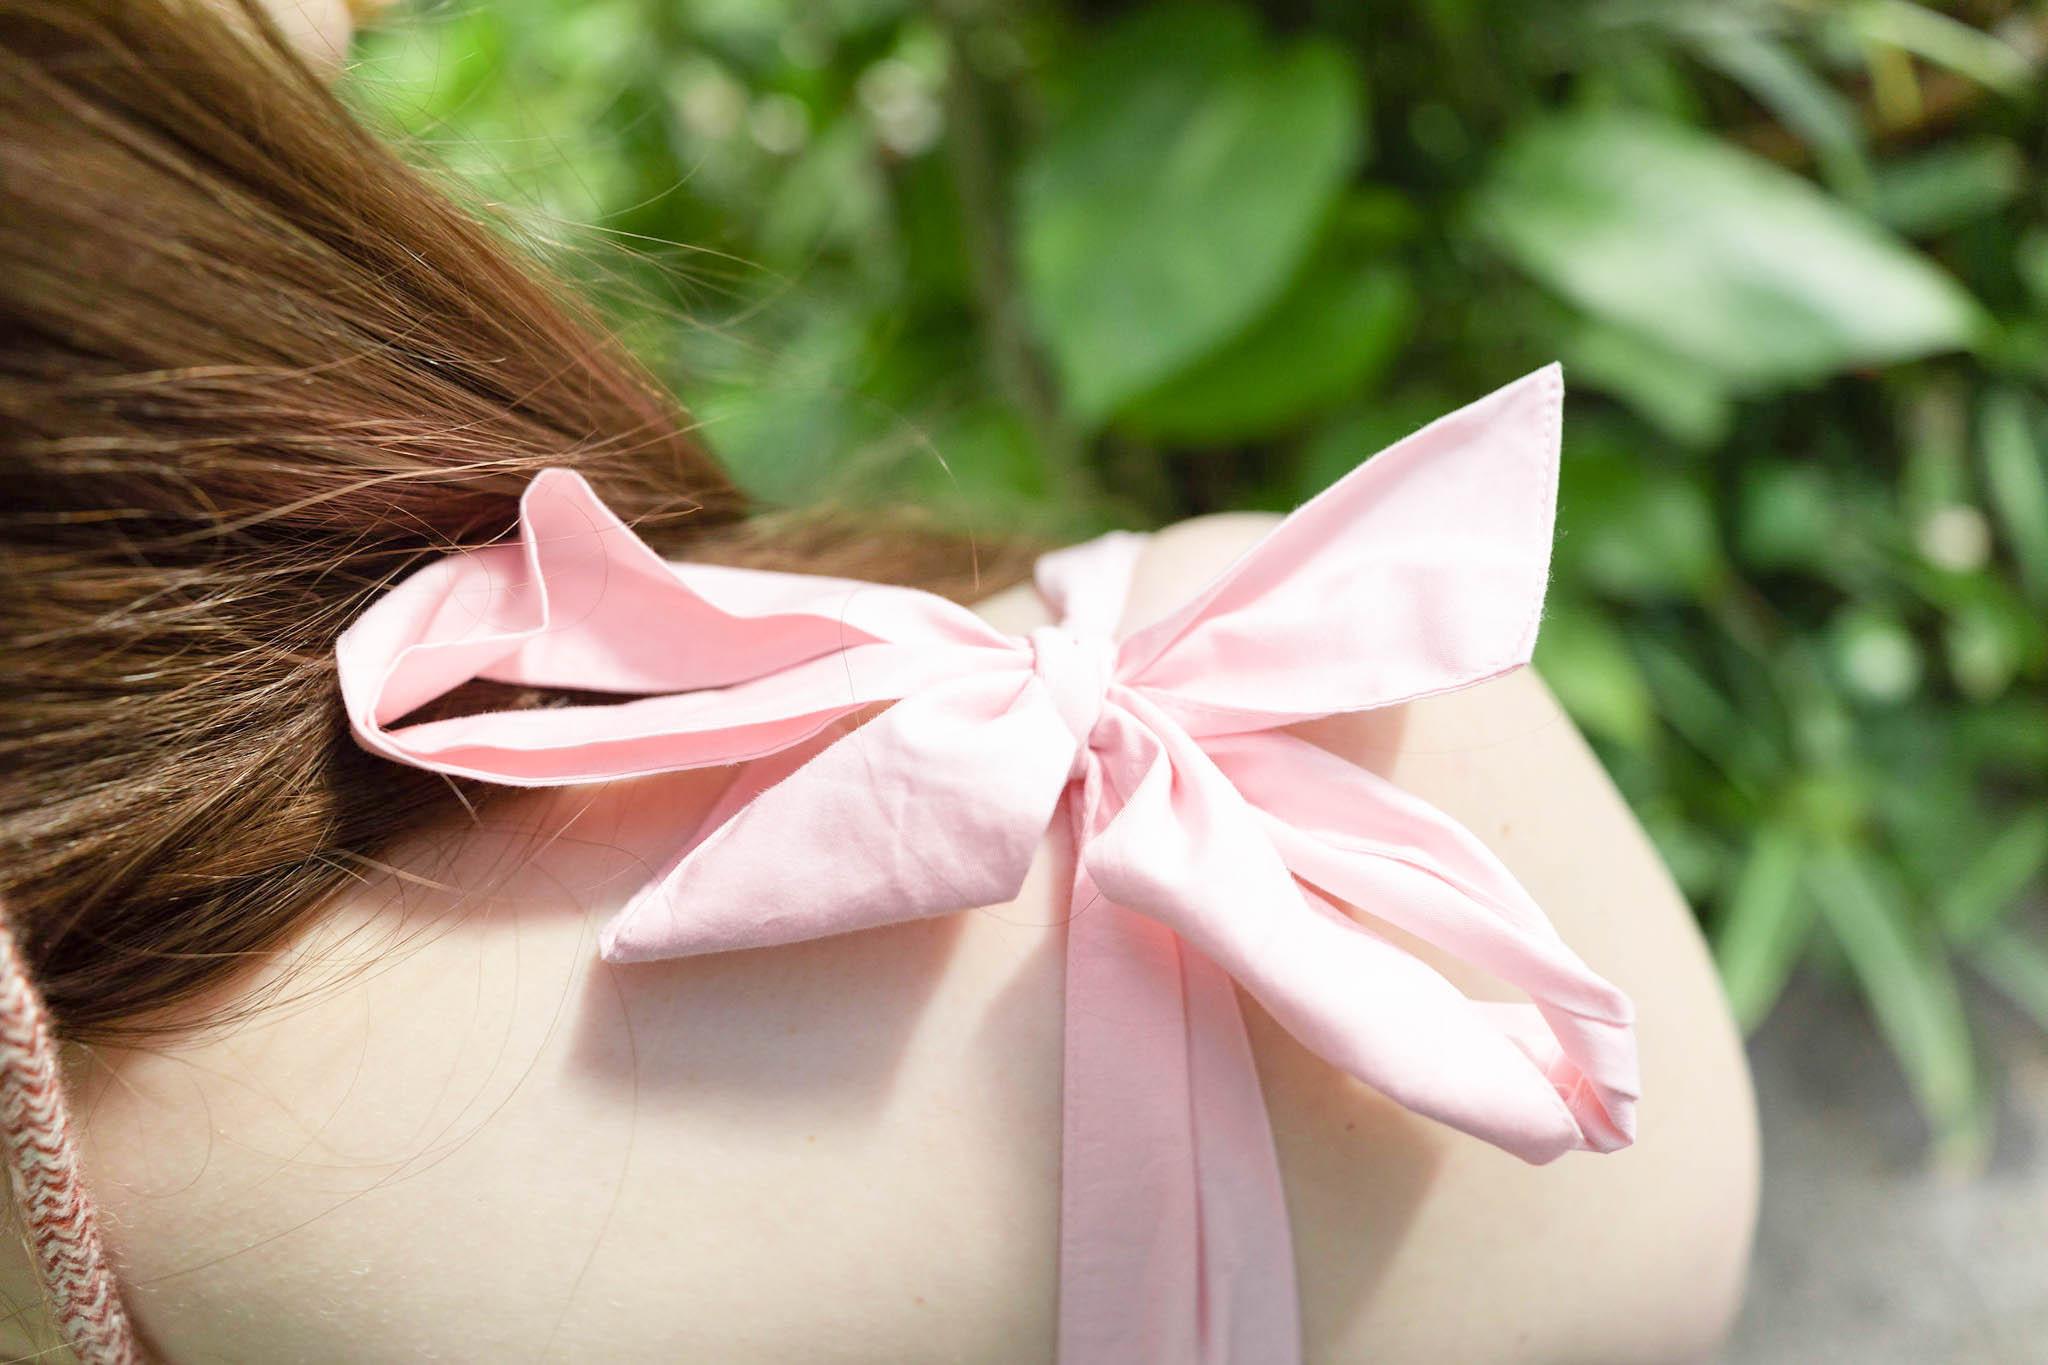 Peachy Pink Summer Dress Juliet Dunn Worn and Styled by Annie Fairfax